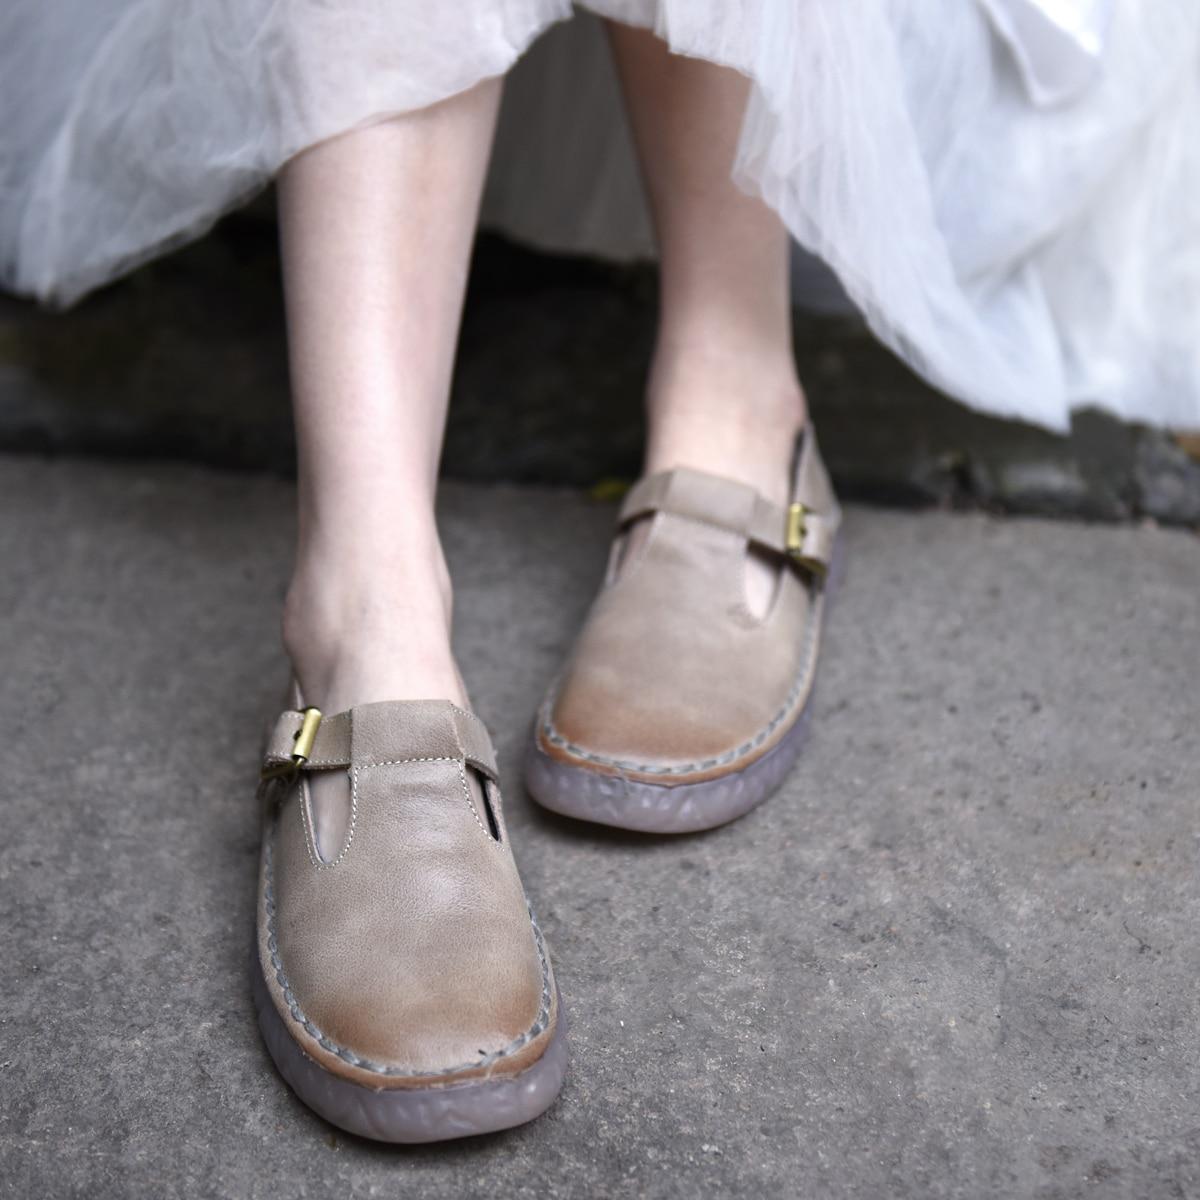 Artmu Original Retro Flat Sole Women's Shoes Soft Bottom Slip-on Loafers Genuine Leather Handmade Shoes Simple Versatile Shoes